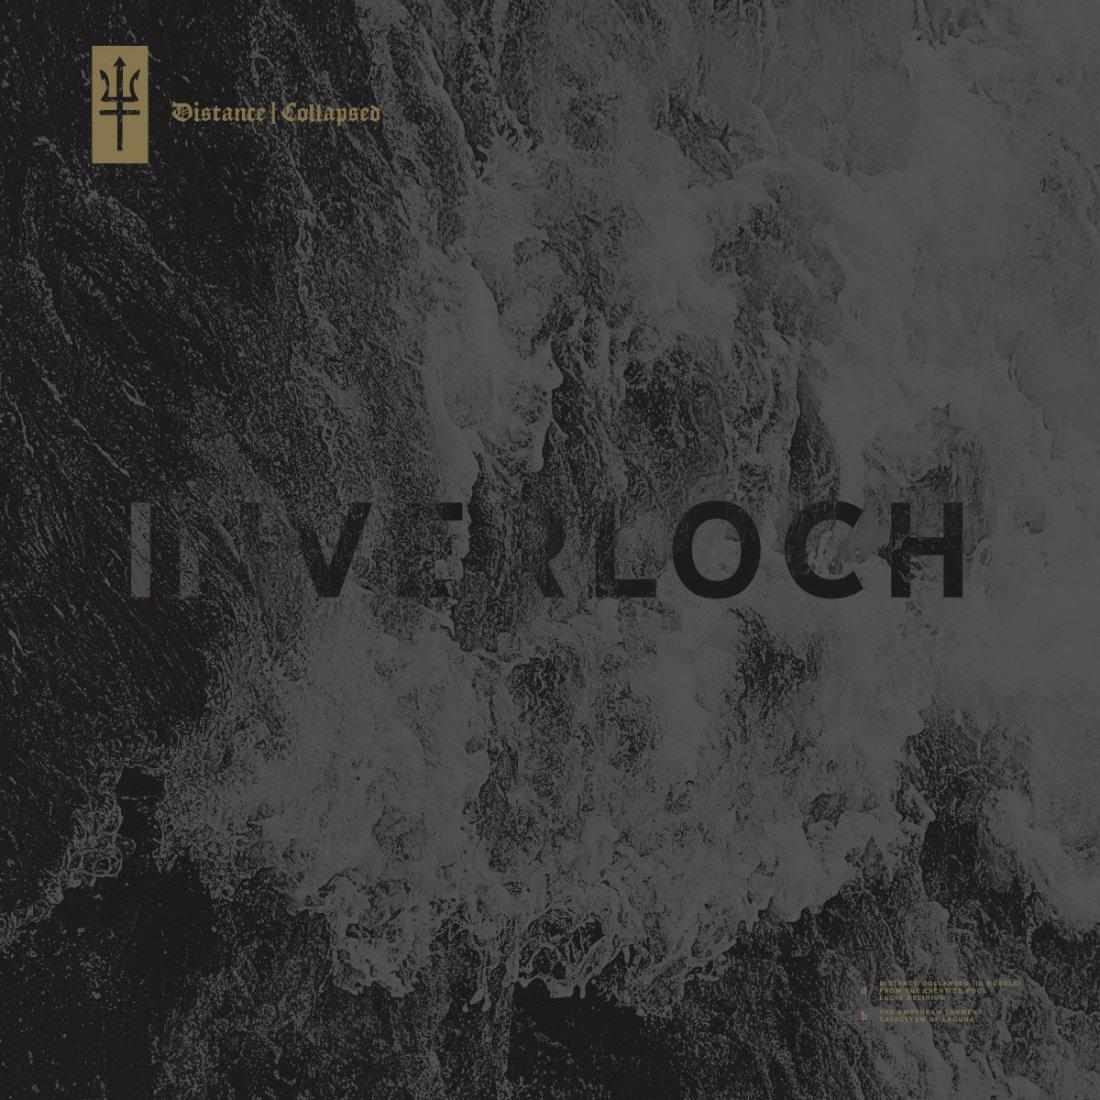 Inverloch-Distance-Collapsed